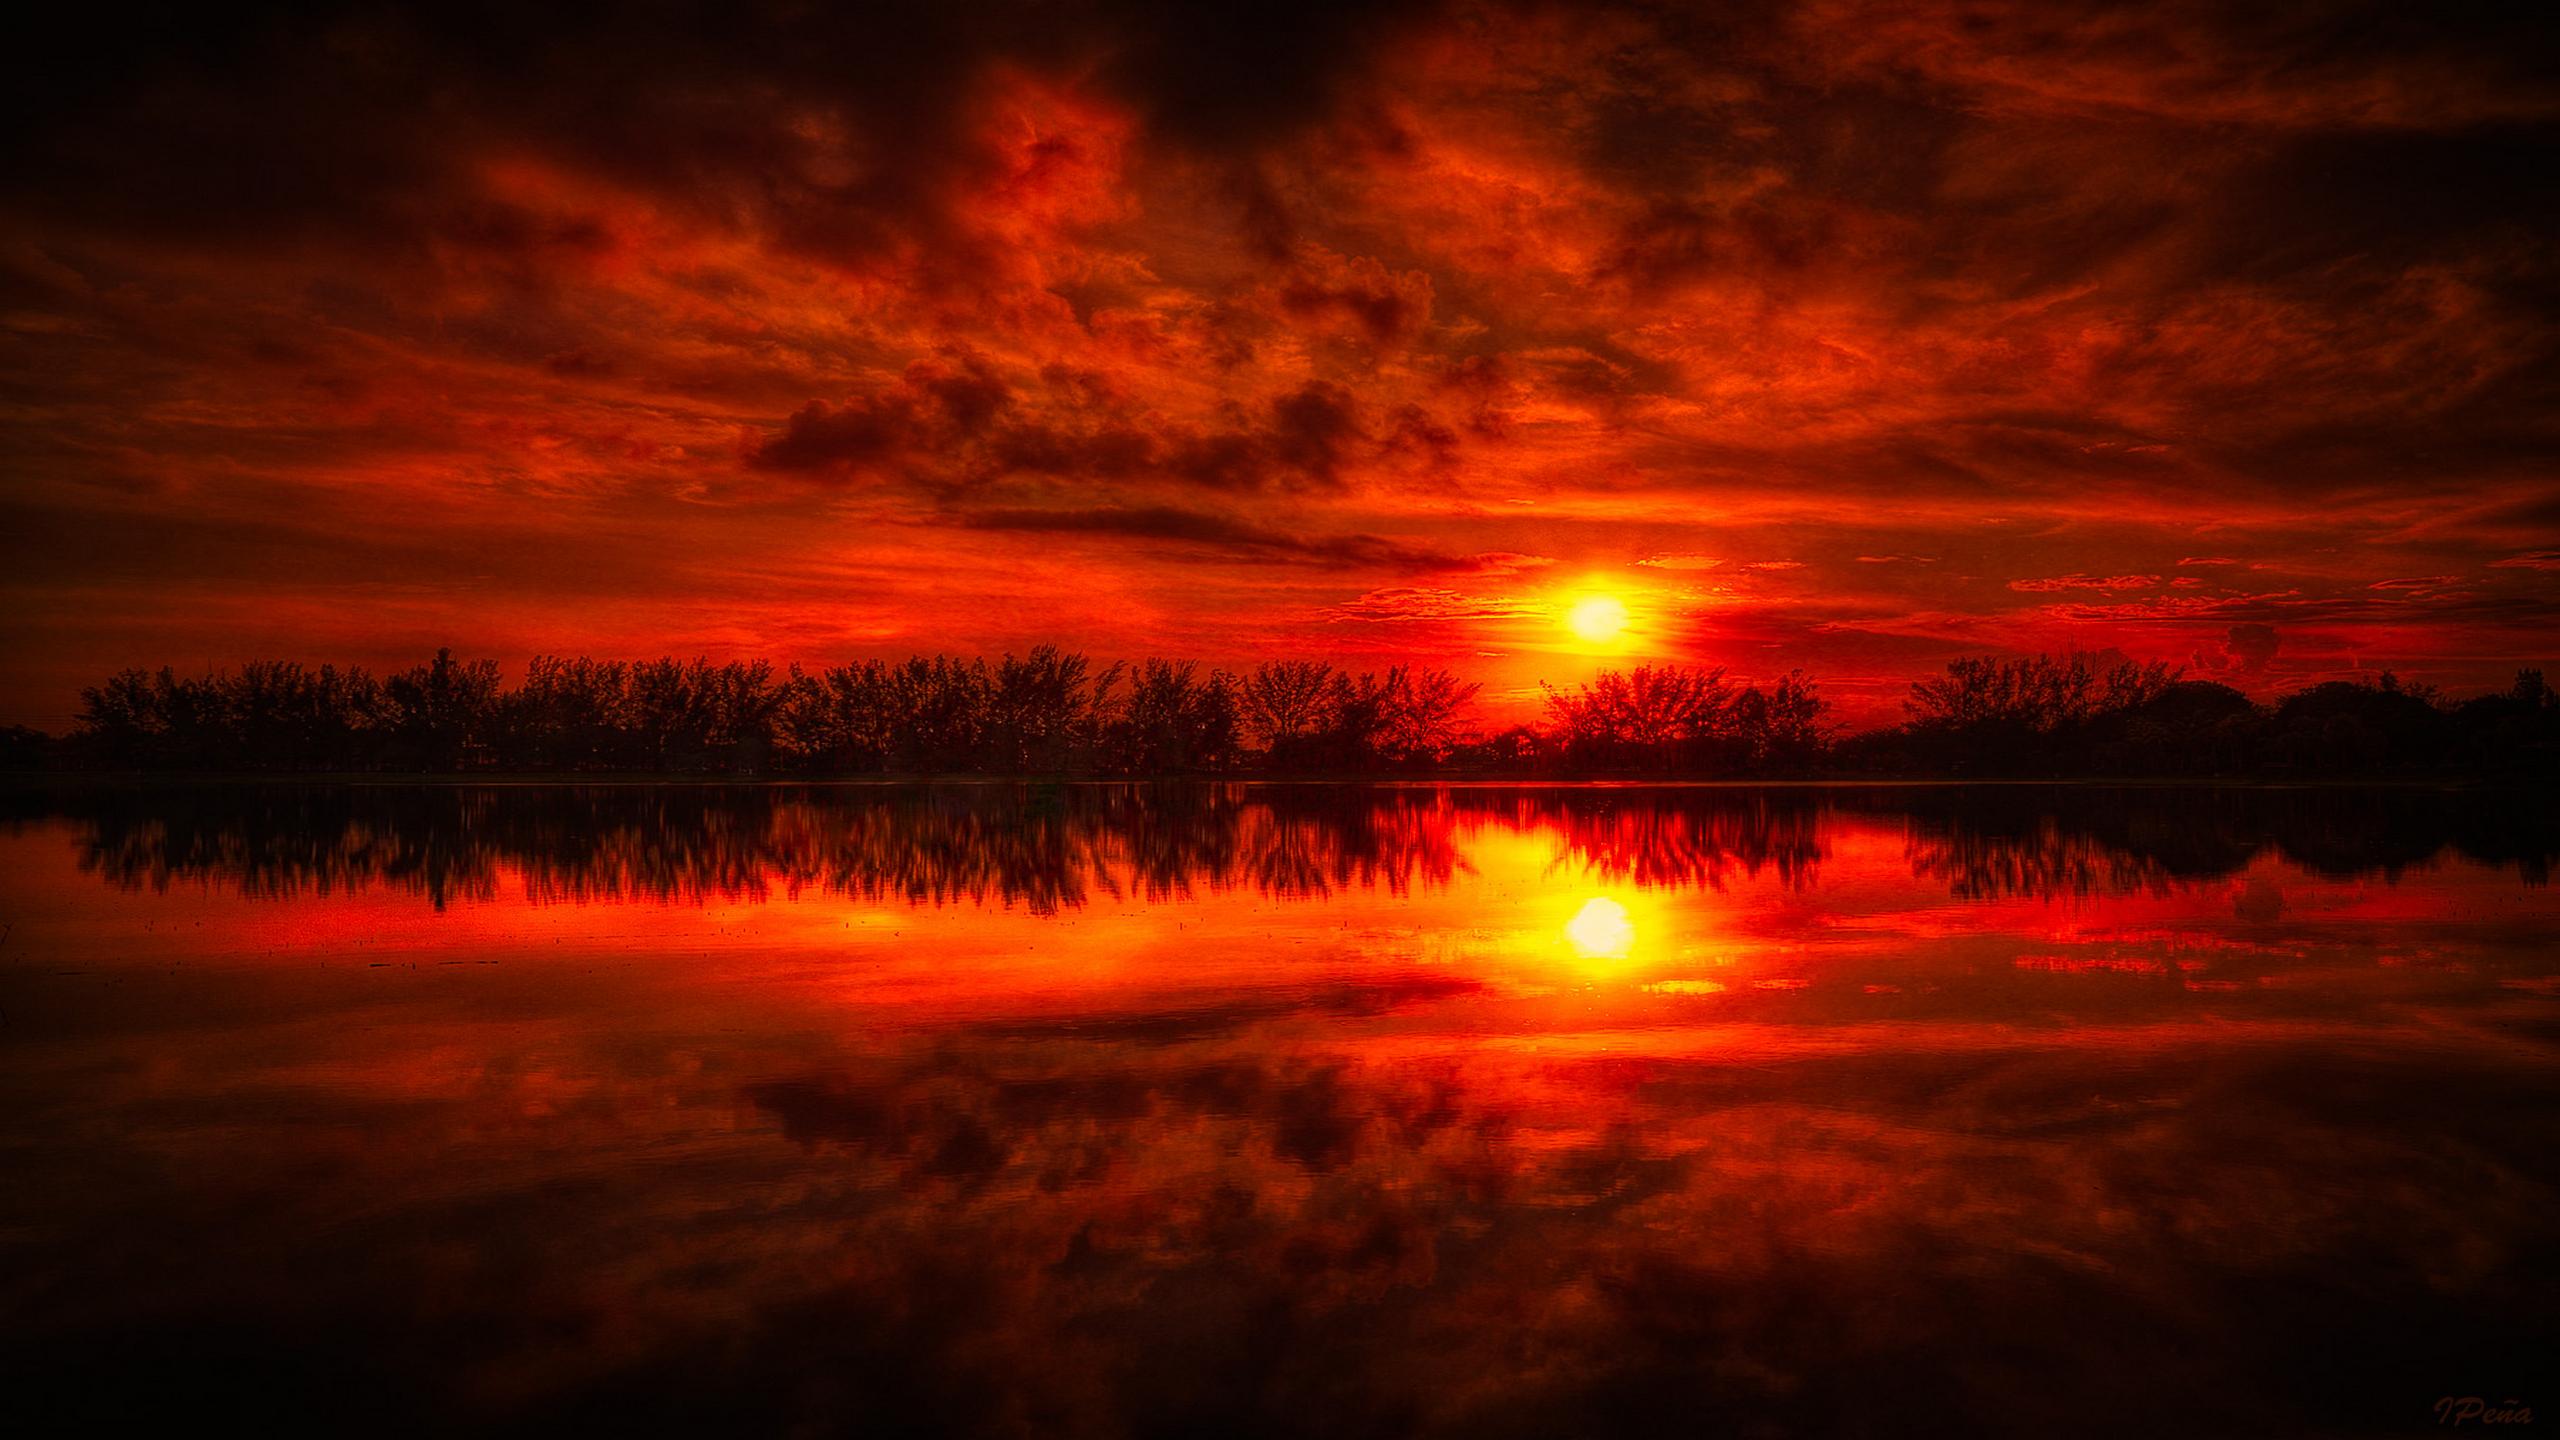 Good Wallpaper Horse Sunrise - tumblr_static_3n2u6i84g58gscsg848w484sw  2018_984350.jpg